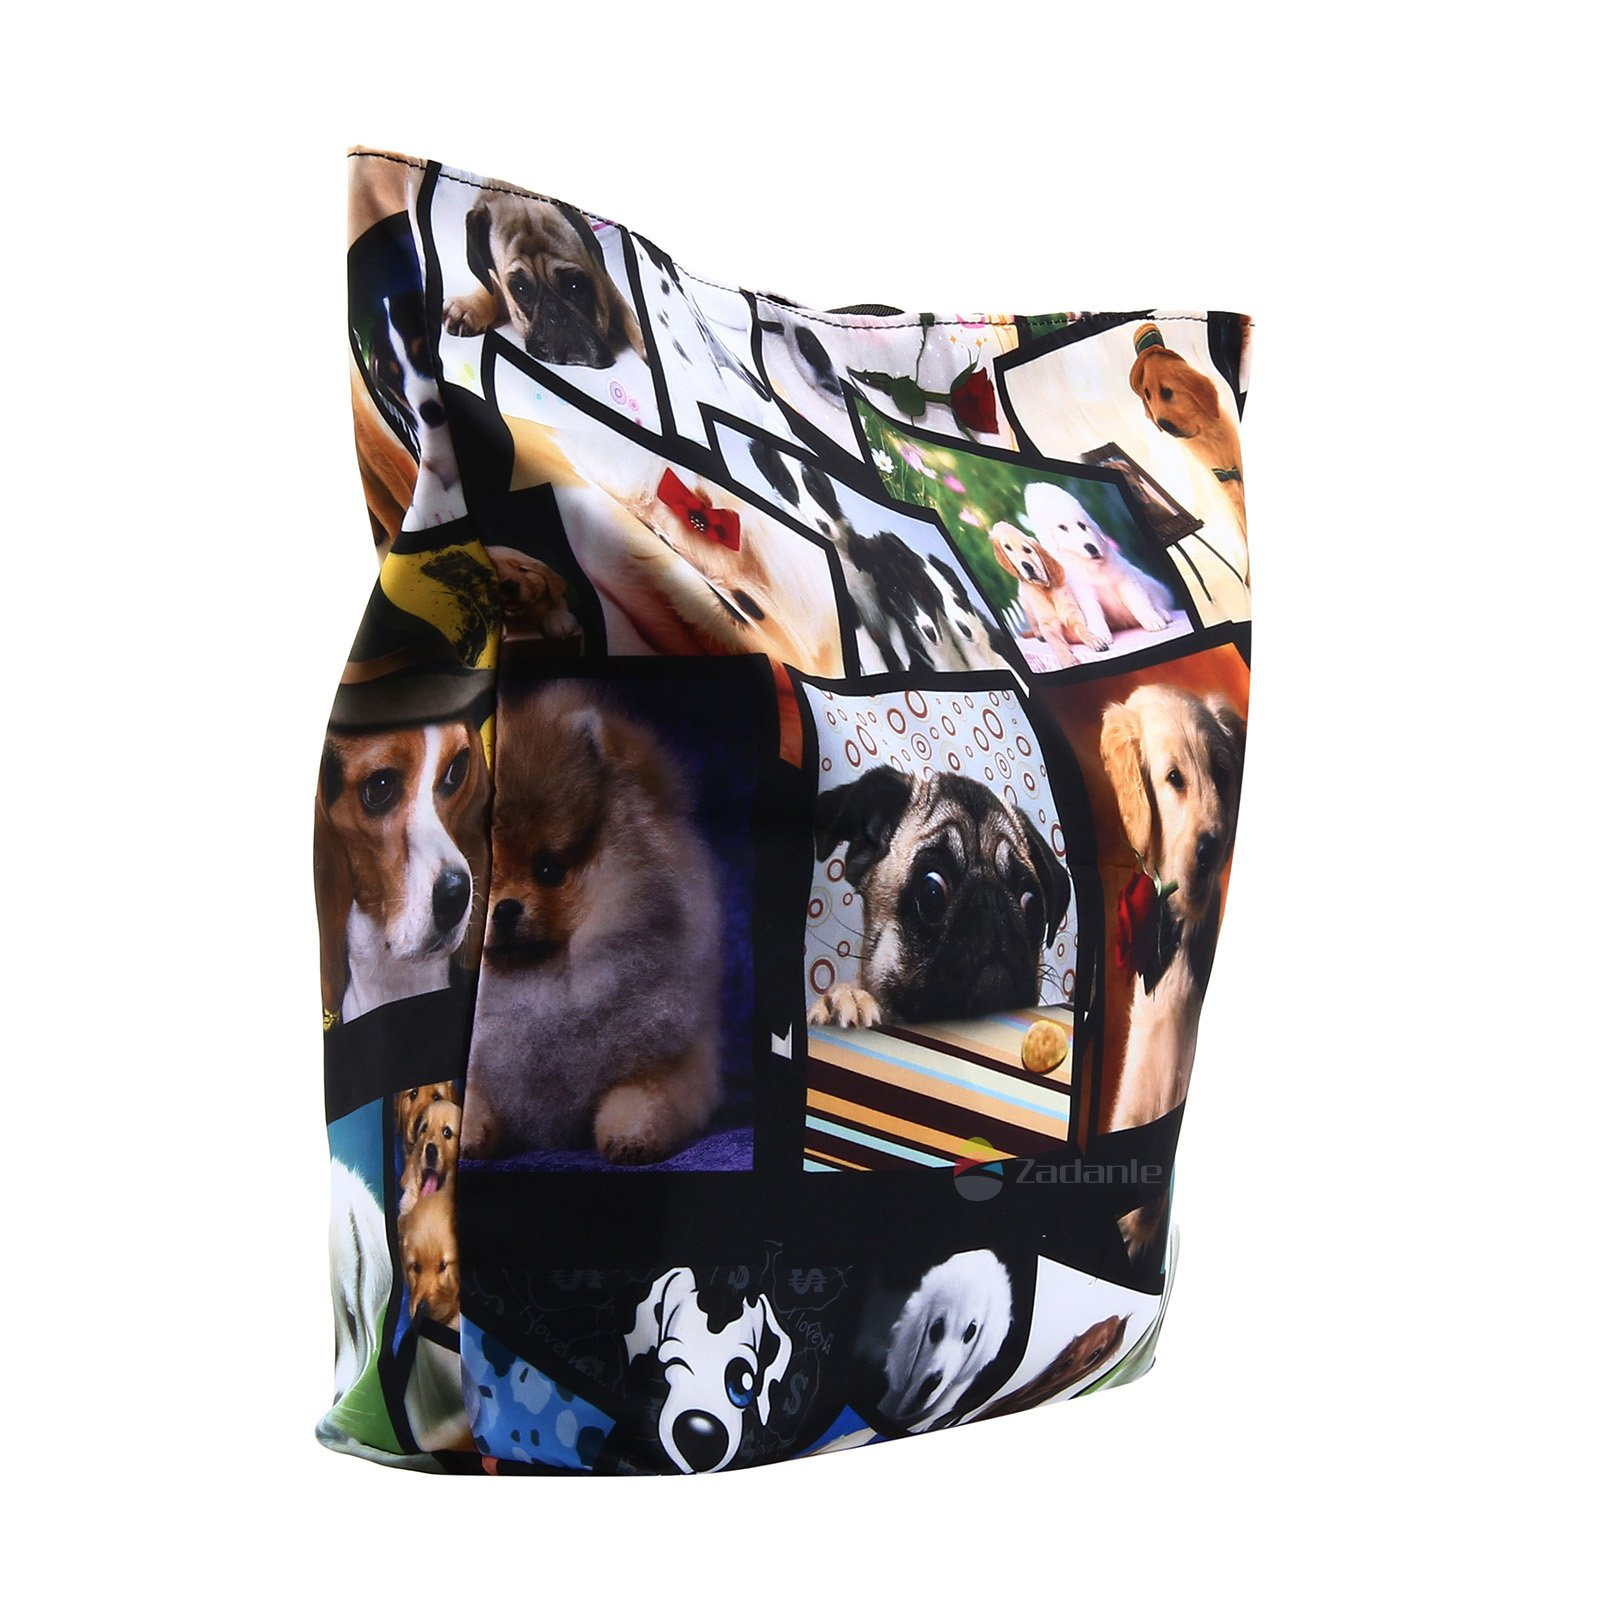 Newplenty Ladies Zippered Light Shoulder Shopping Tote Bag Handbag Beach Satchel, Many Dogs by newplenty (Image #3)